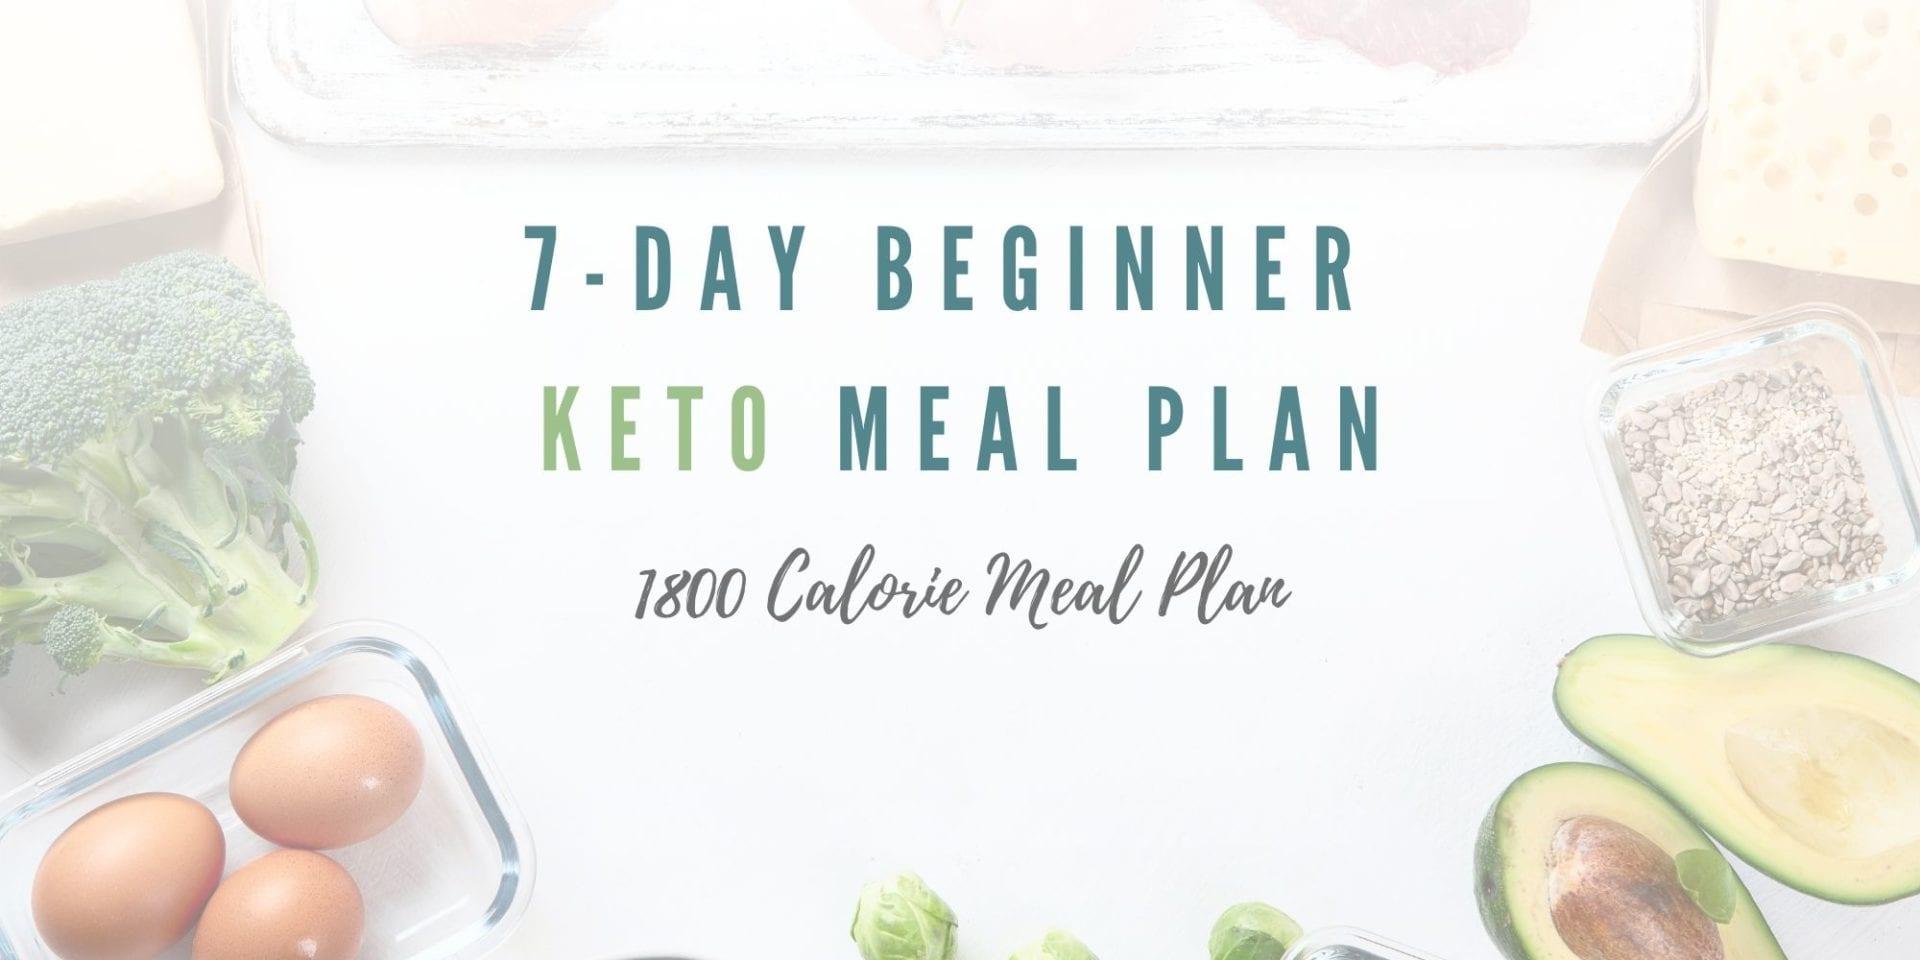 7 Day Beginner - 1,800 Calorie Meal Plan